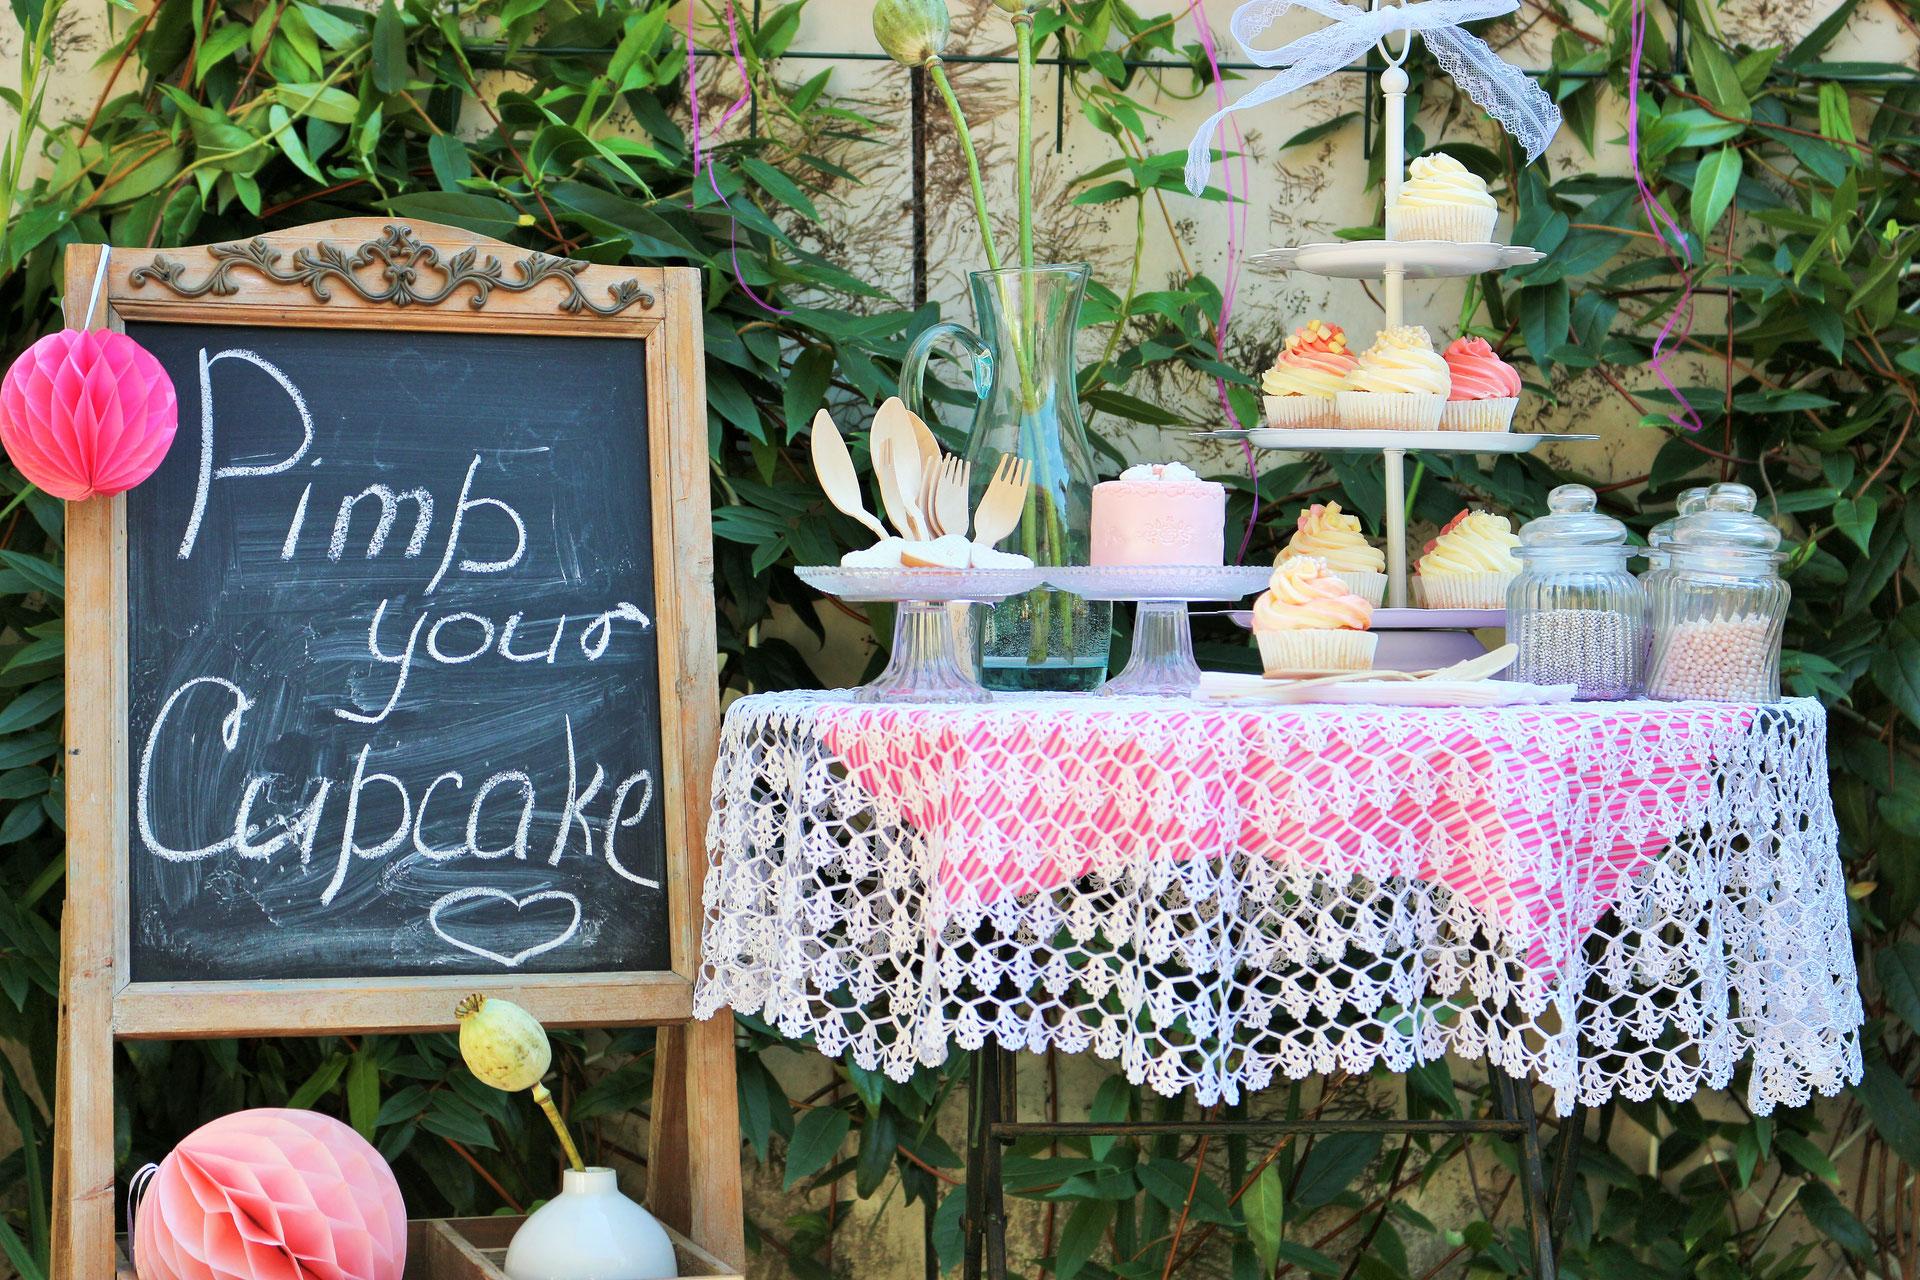 Pimp-your-Cupcake Bar - Partystories Blog